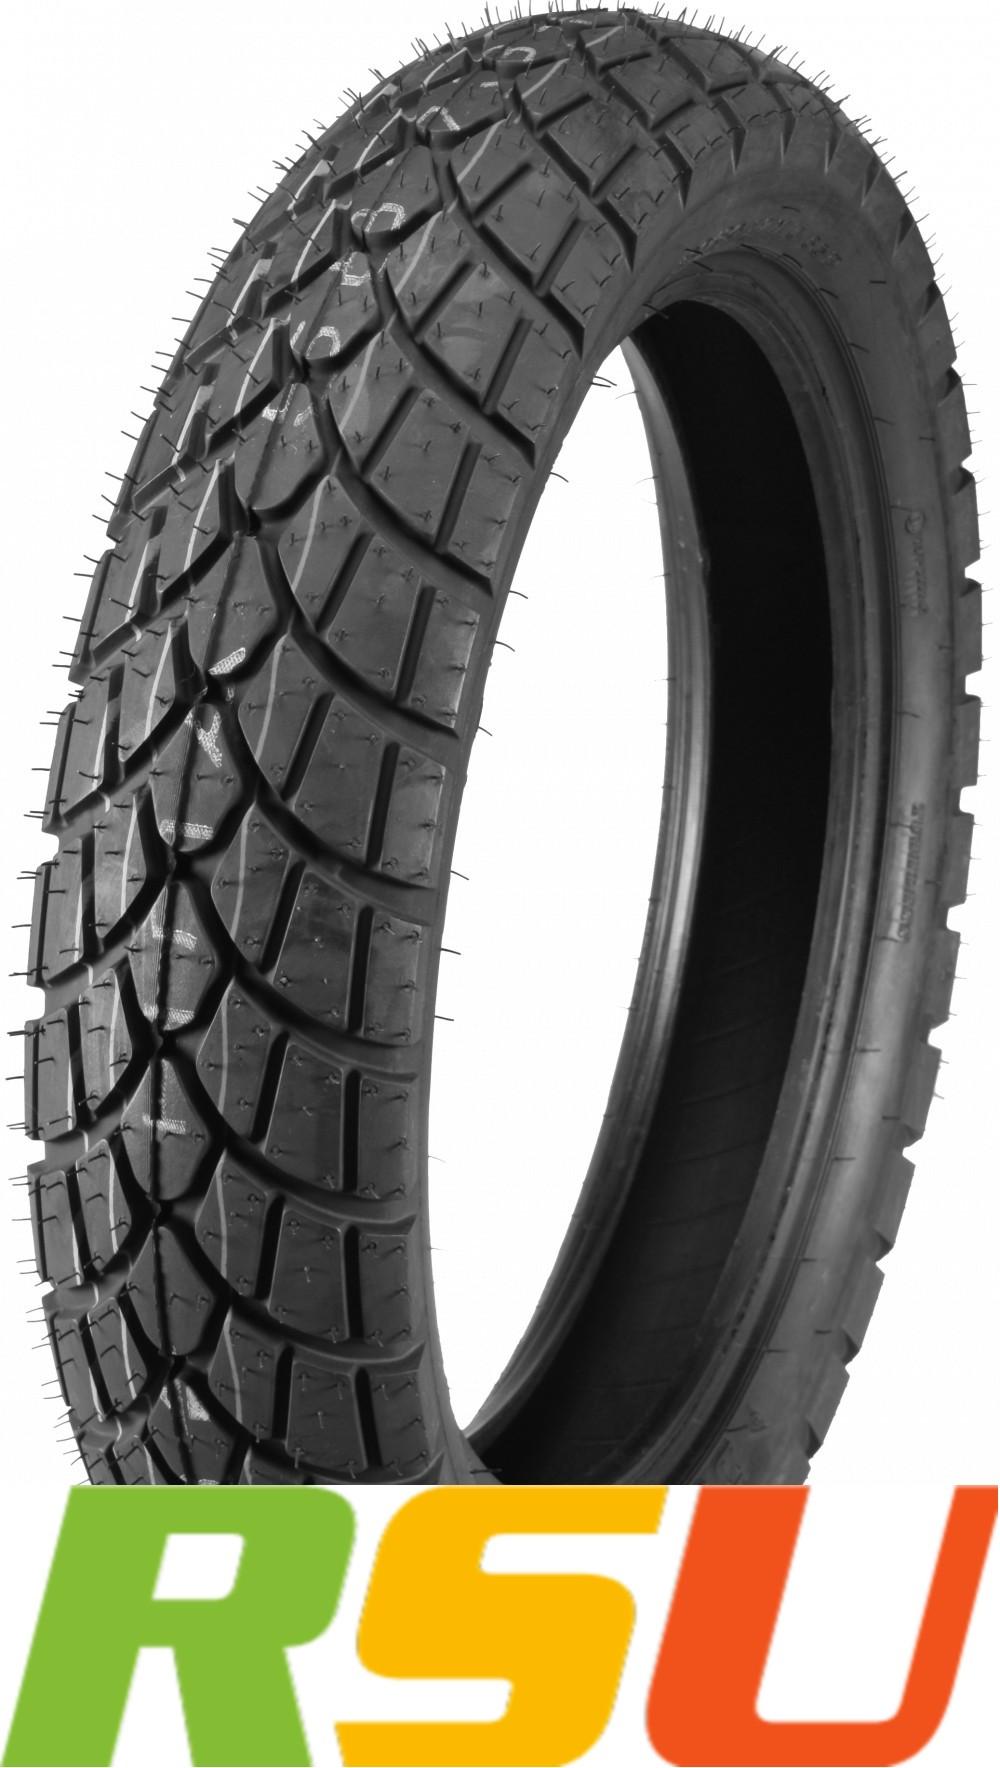 4x Motorradreifen Dunlop D 602 F 100/90-18 56 P